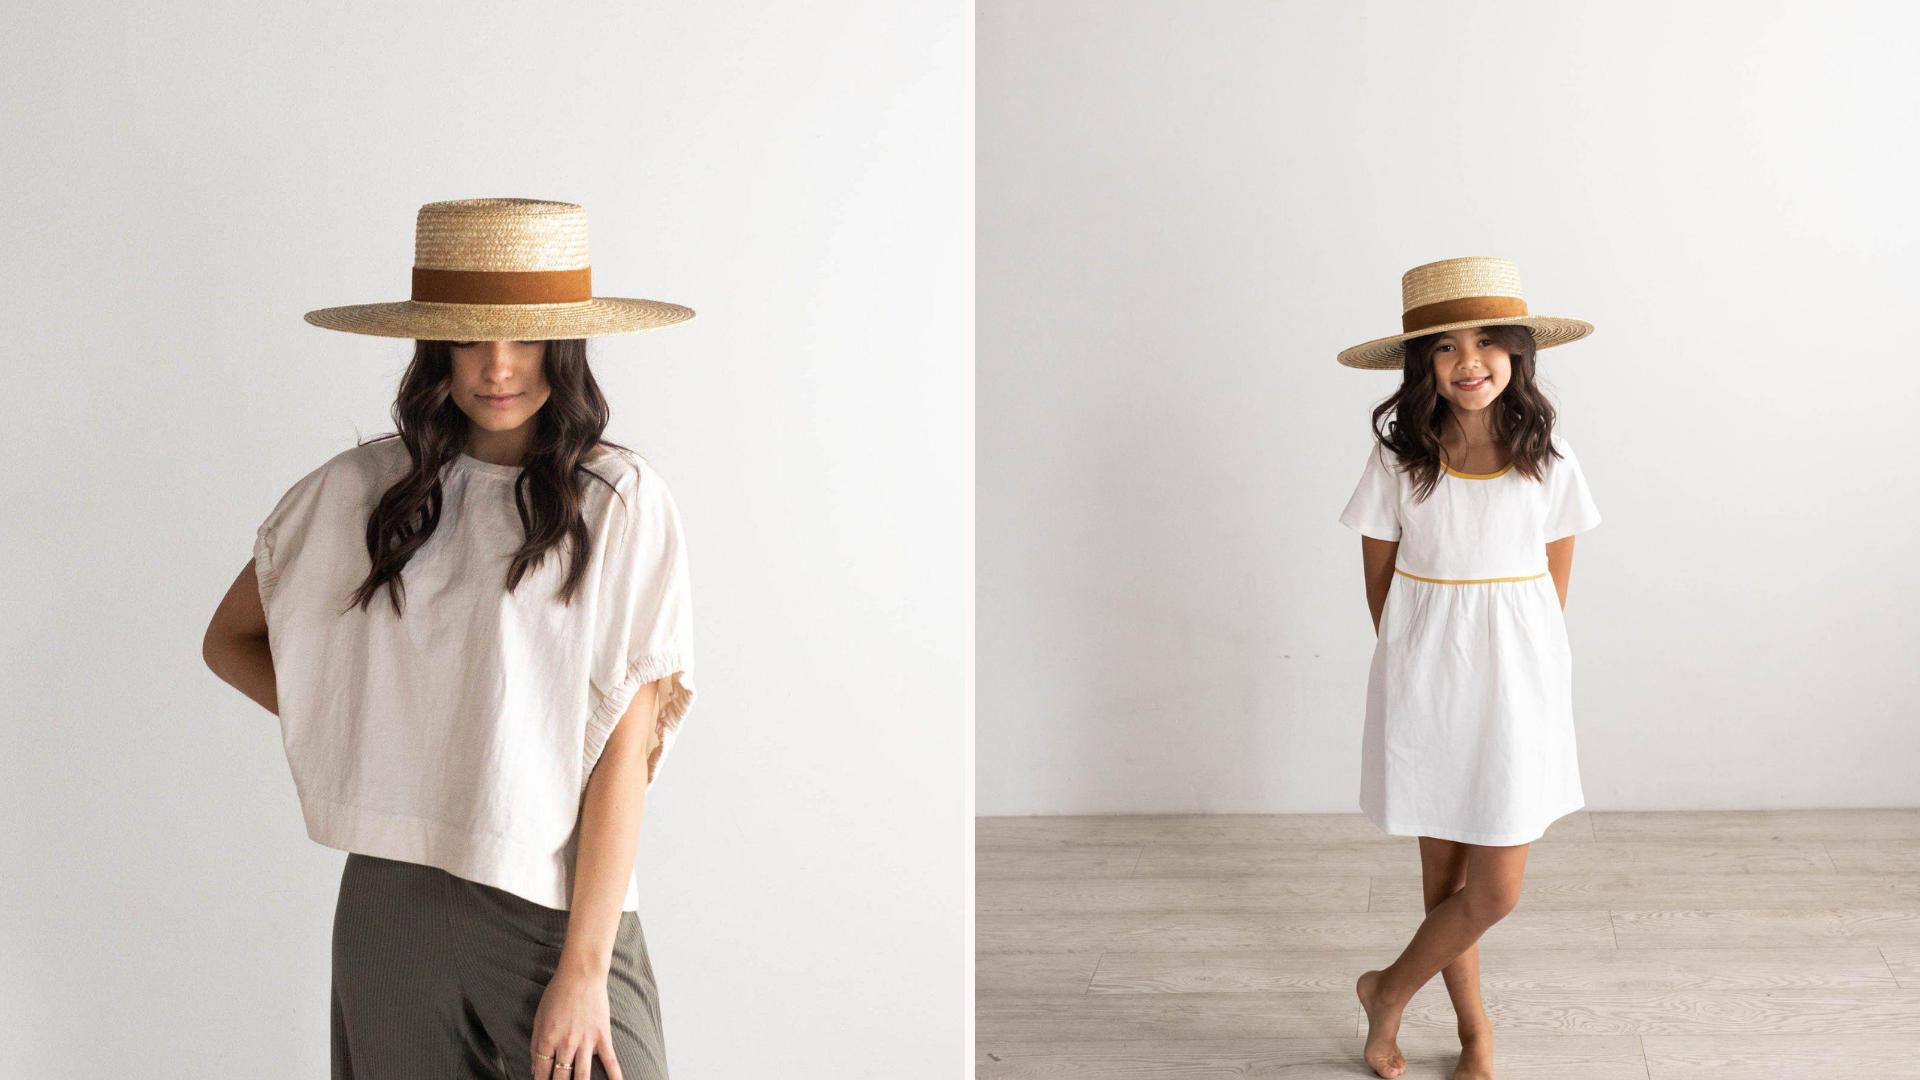 mom wearing a straw wide brim hat next to a child wearing a matching straw wide brim hat